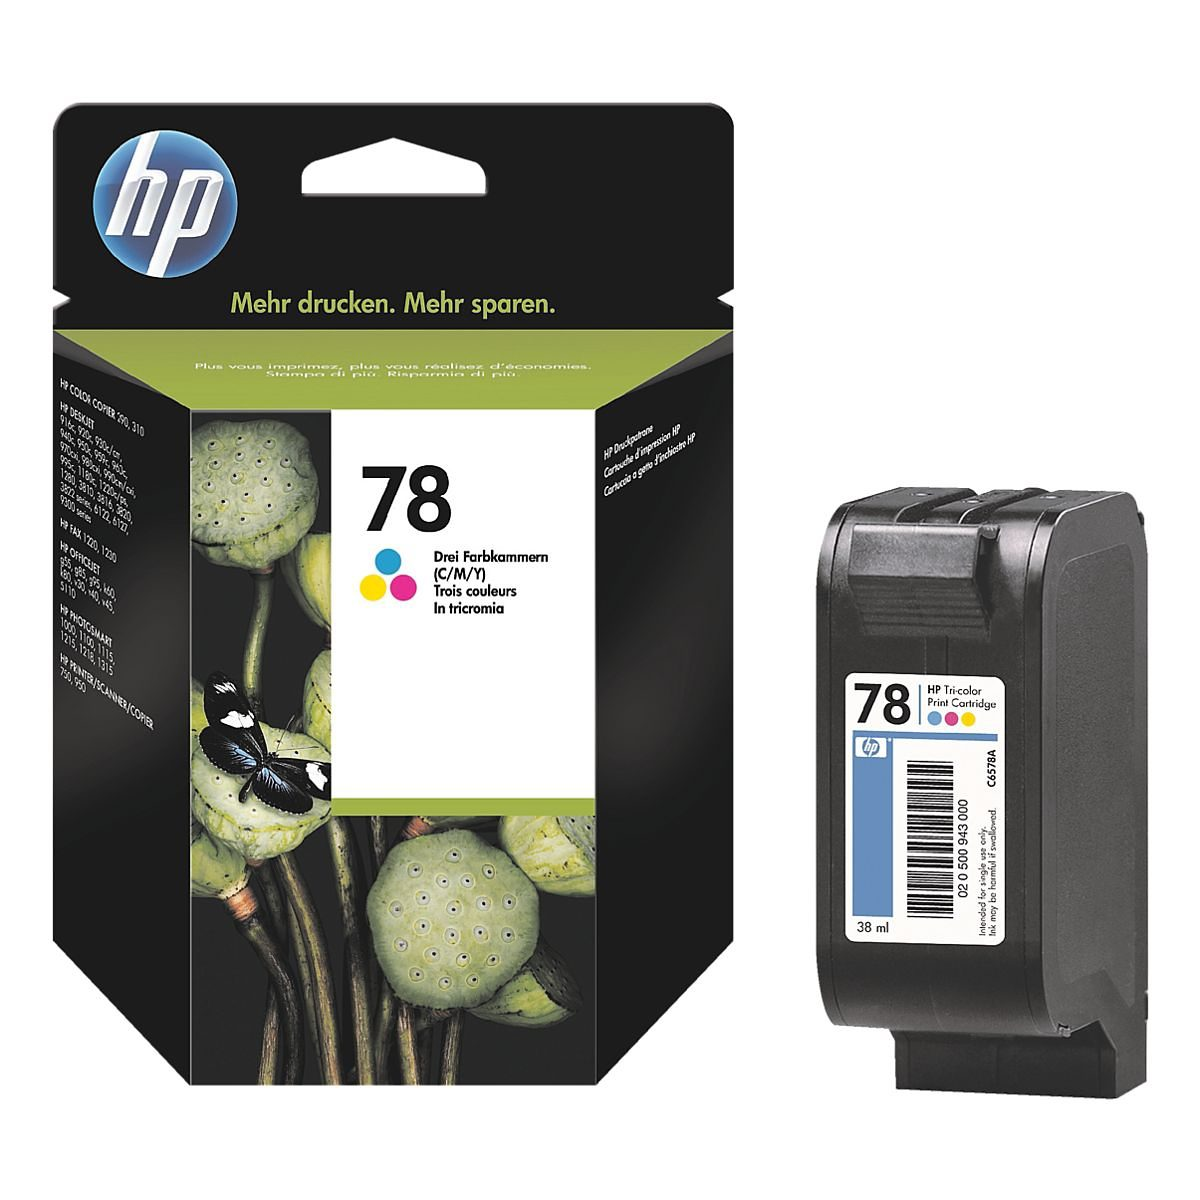 HP Druckpatrone »HP C6578AE« HP 78